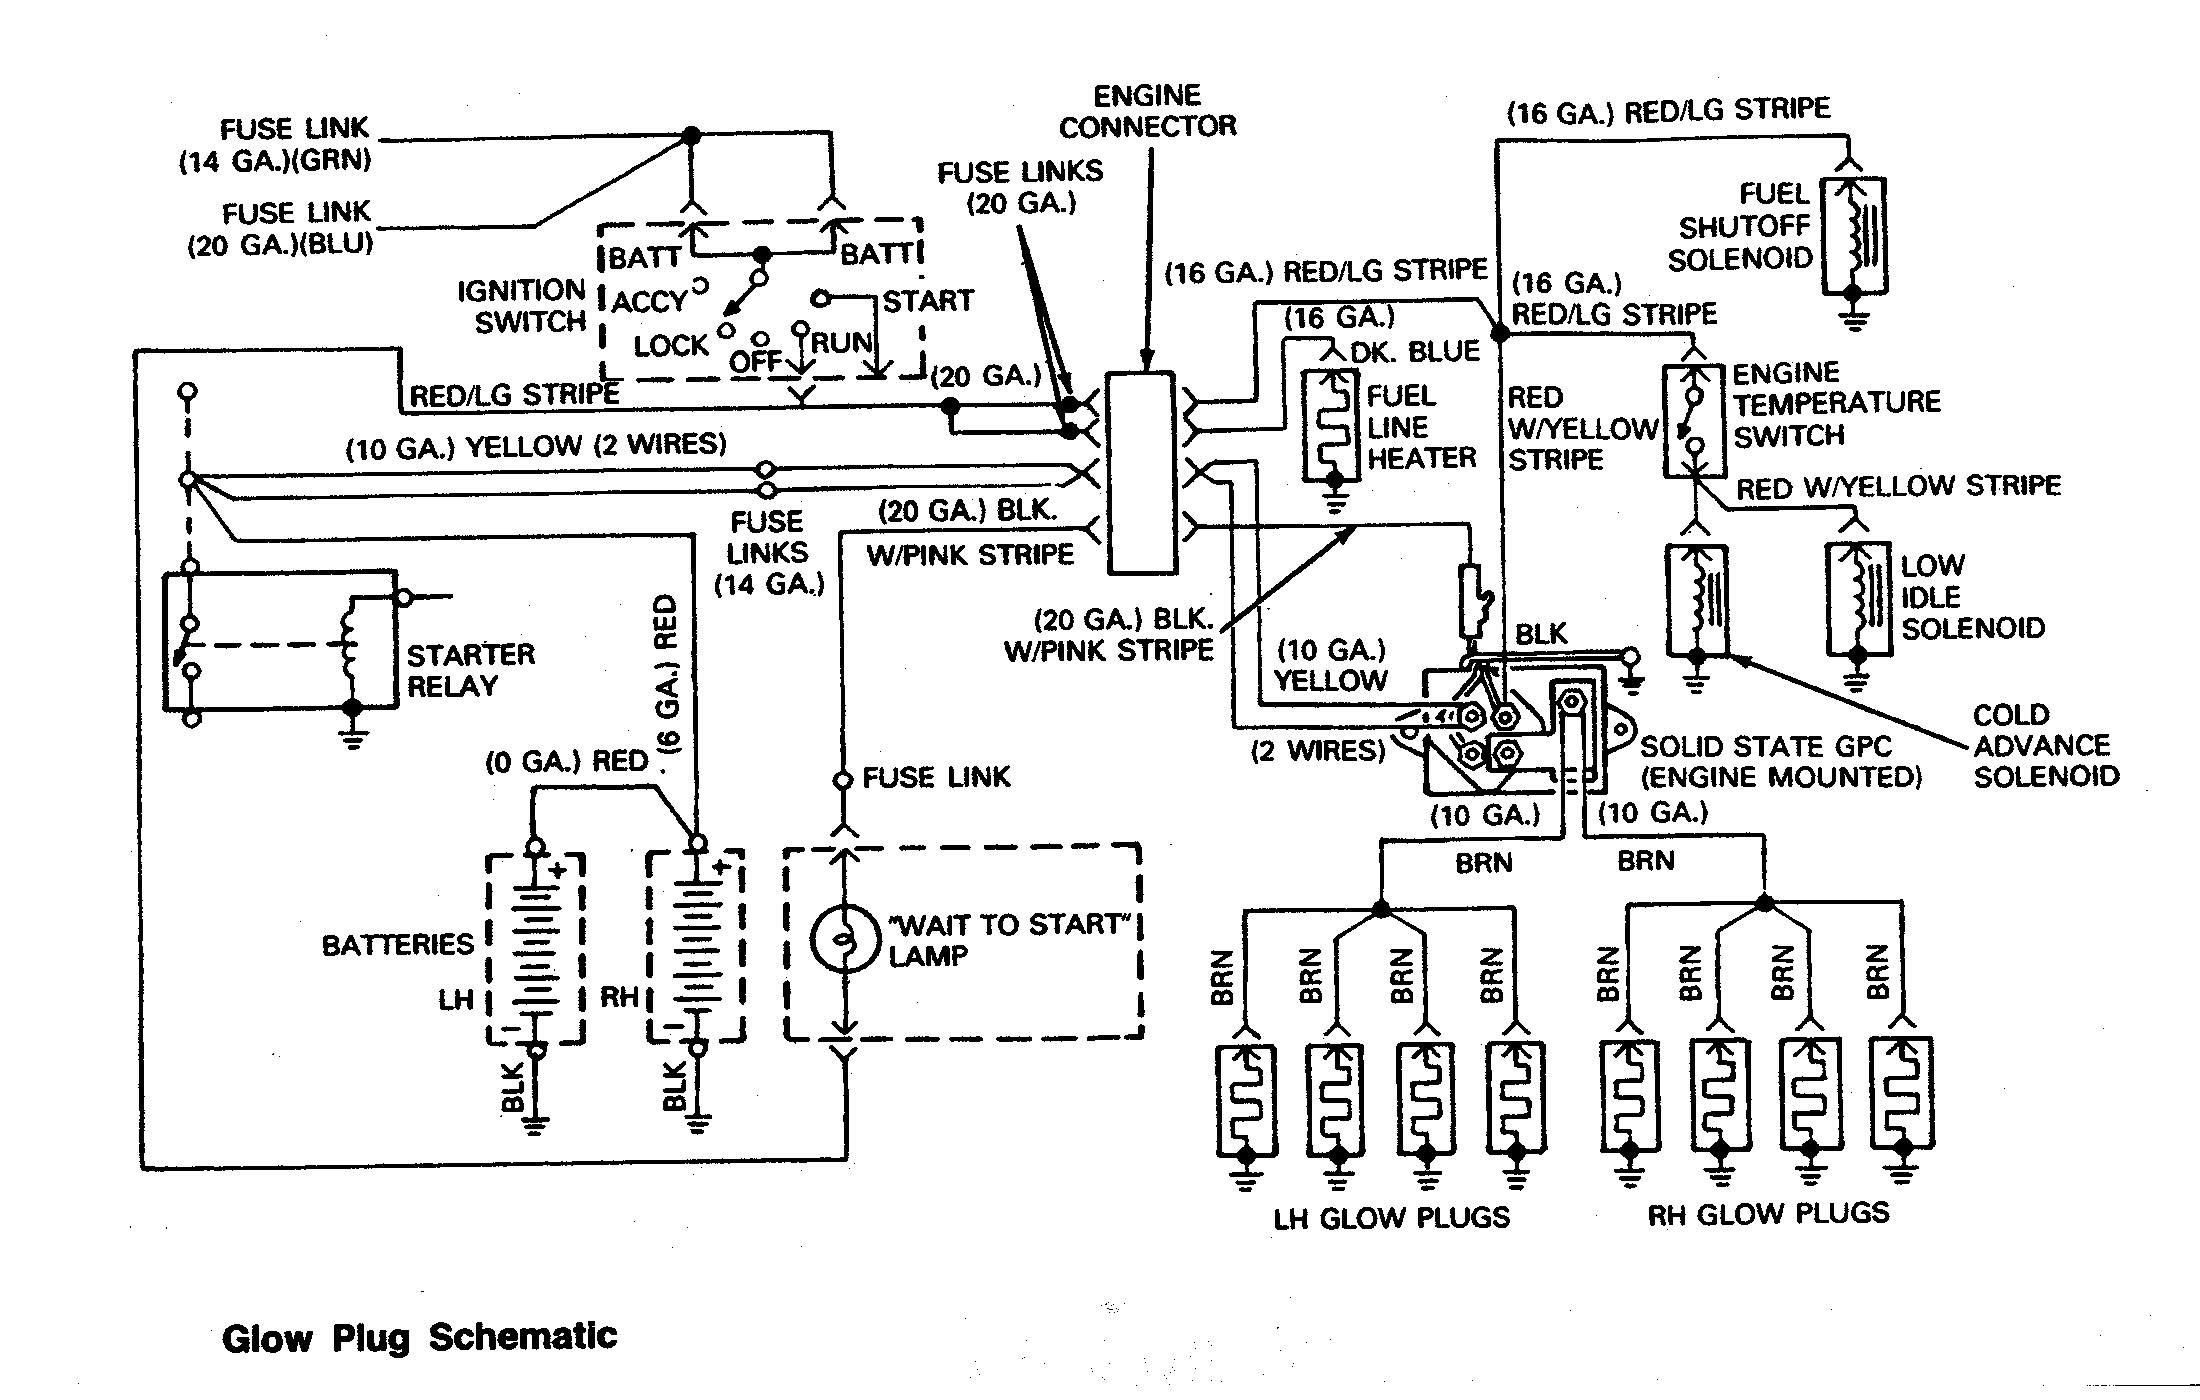 Auto Engine Diagram Glow Engine Diagram Experts Wiring Diagram • Of Auto Engine Diagram